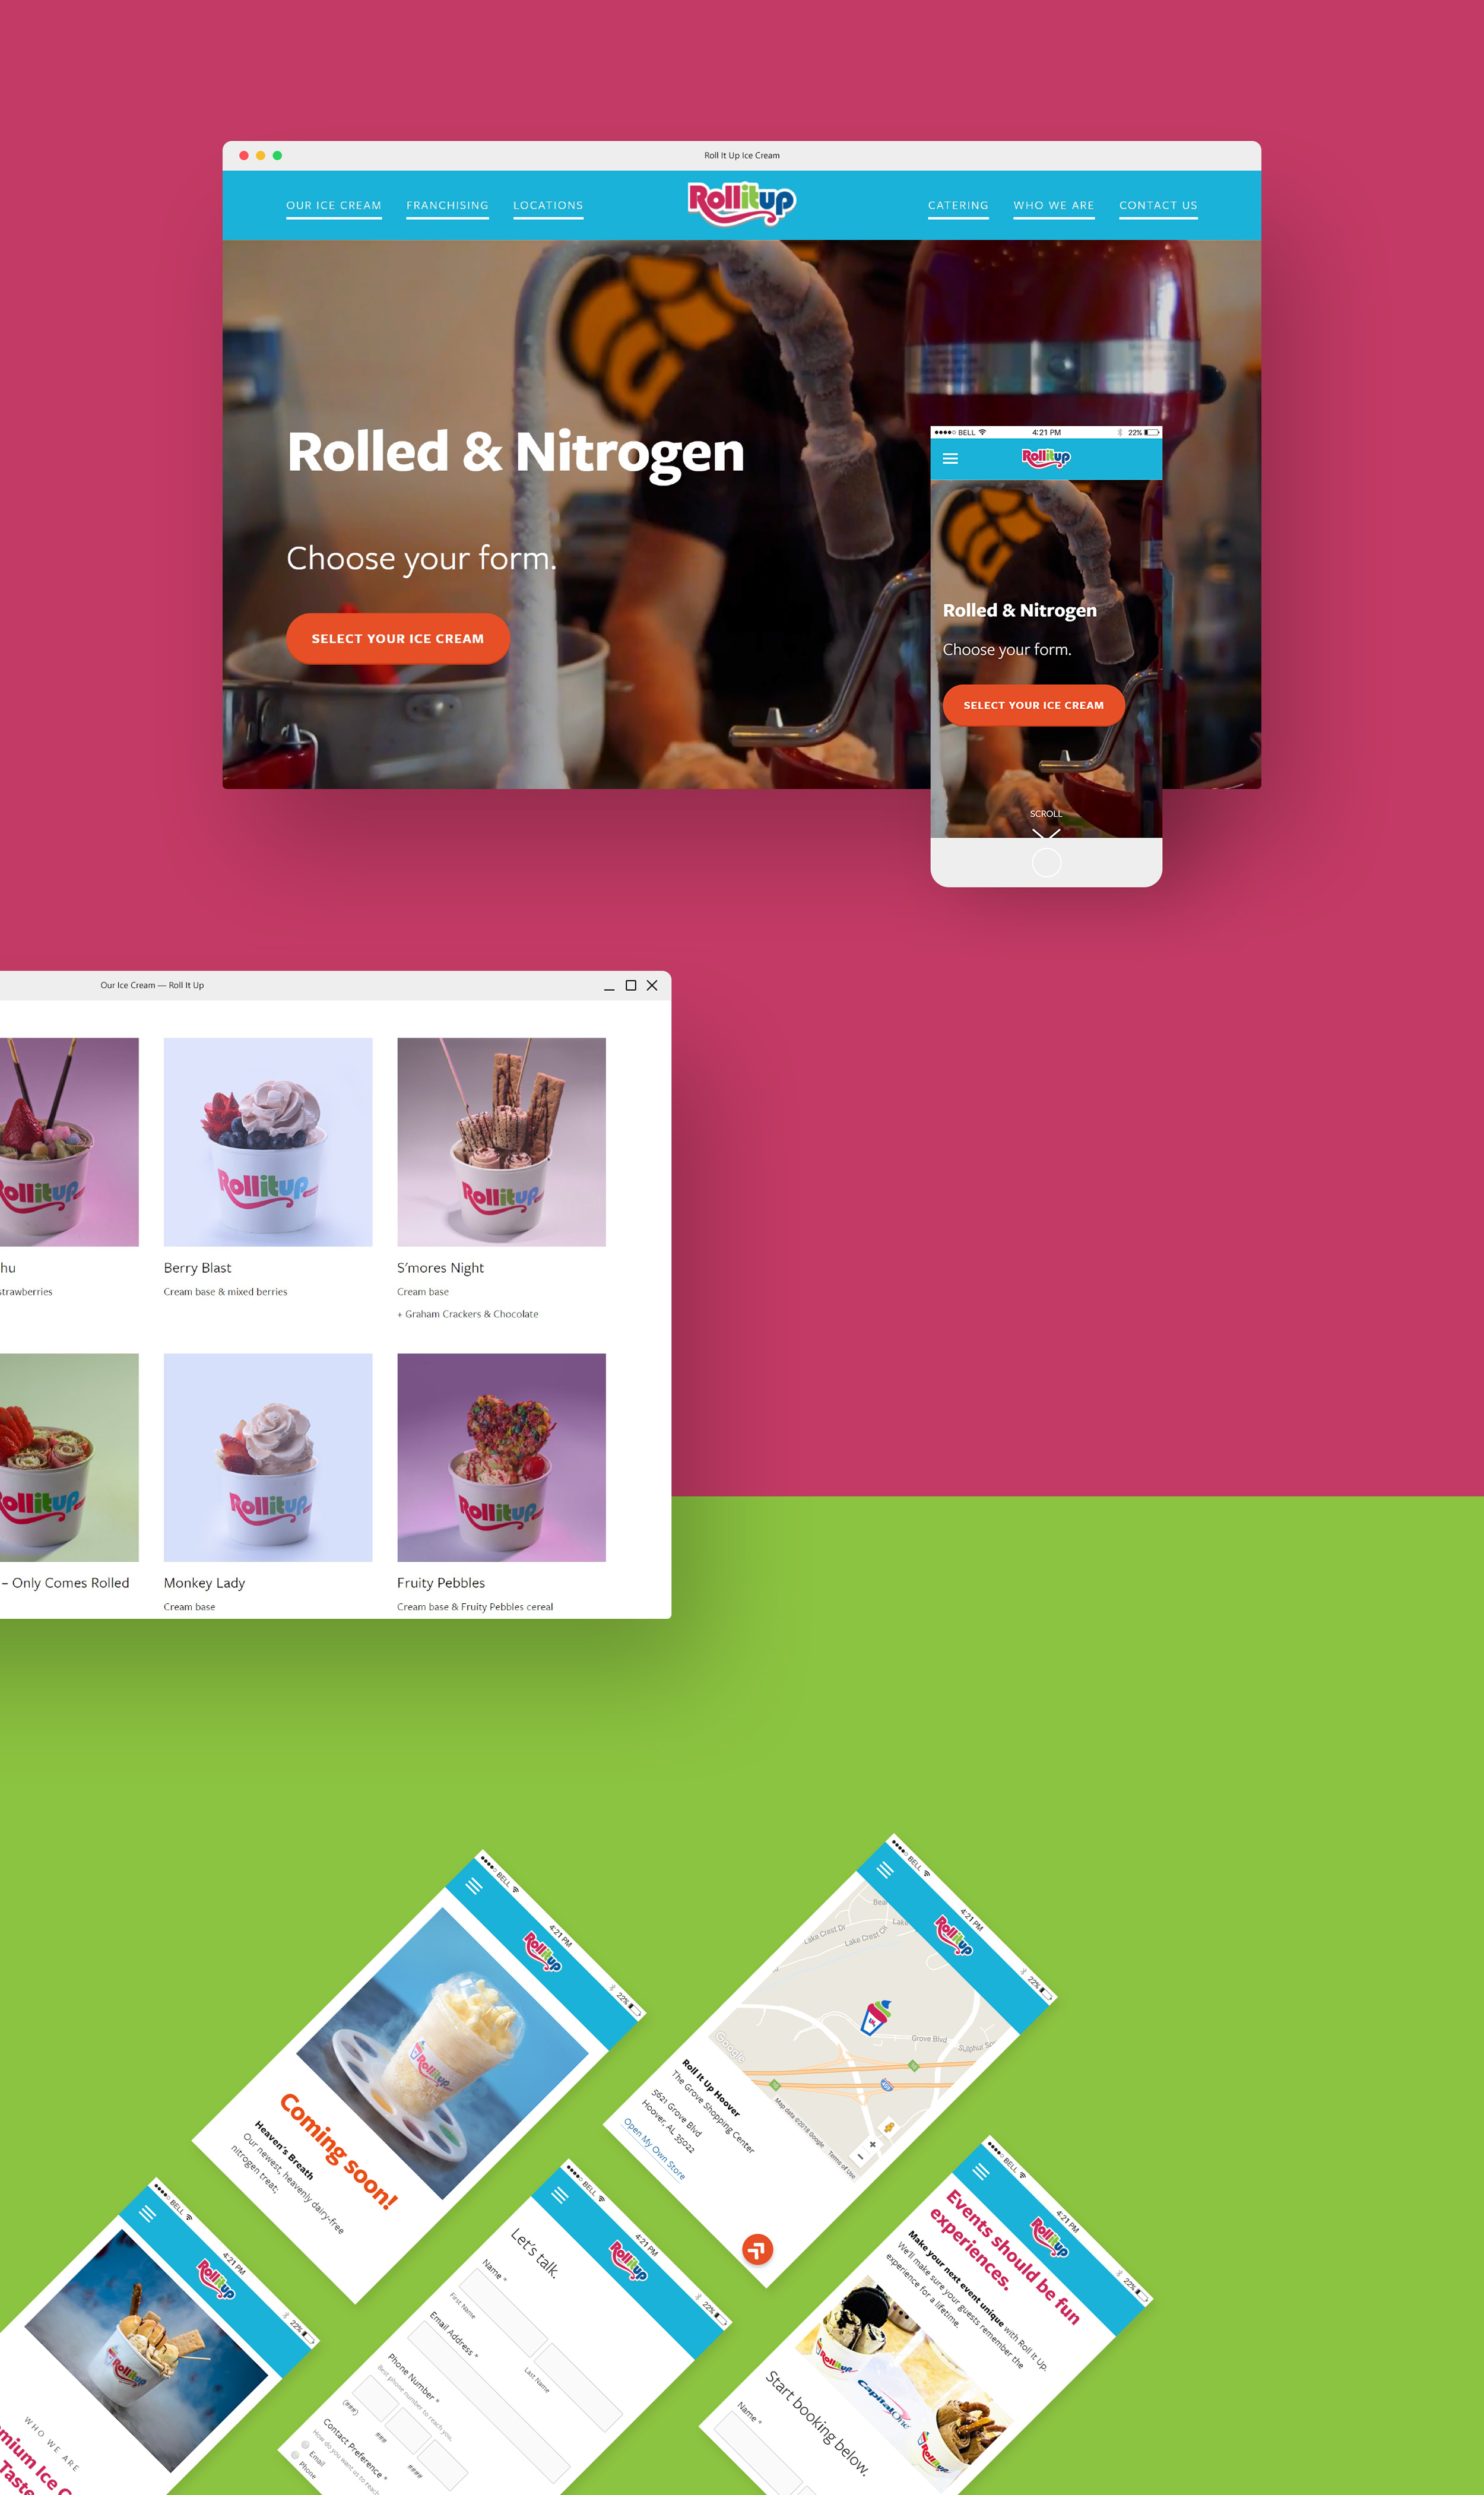 RollItUpIceCrea_mobilesite_UI_graphicdesign_screens.jpg